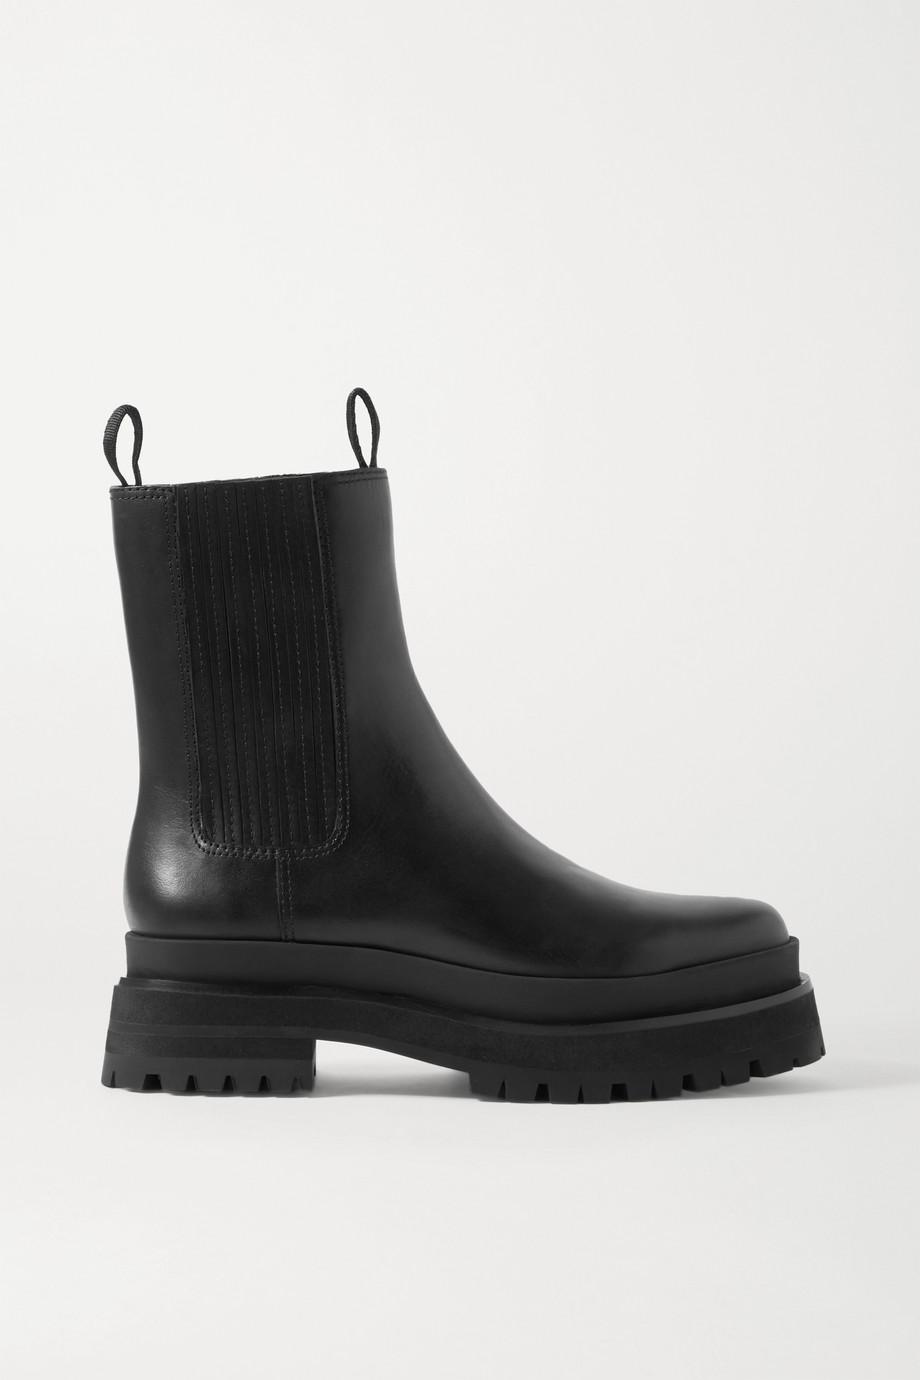 Loeffler Randall Toni 皮革切尔西靴